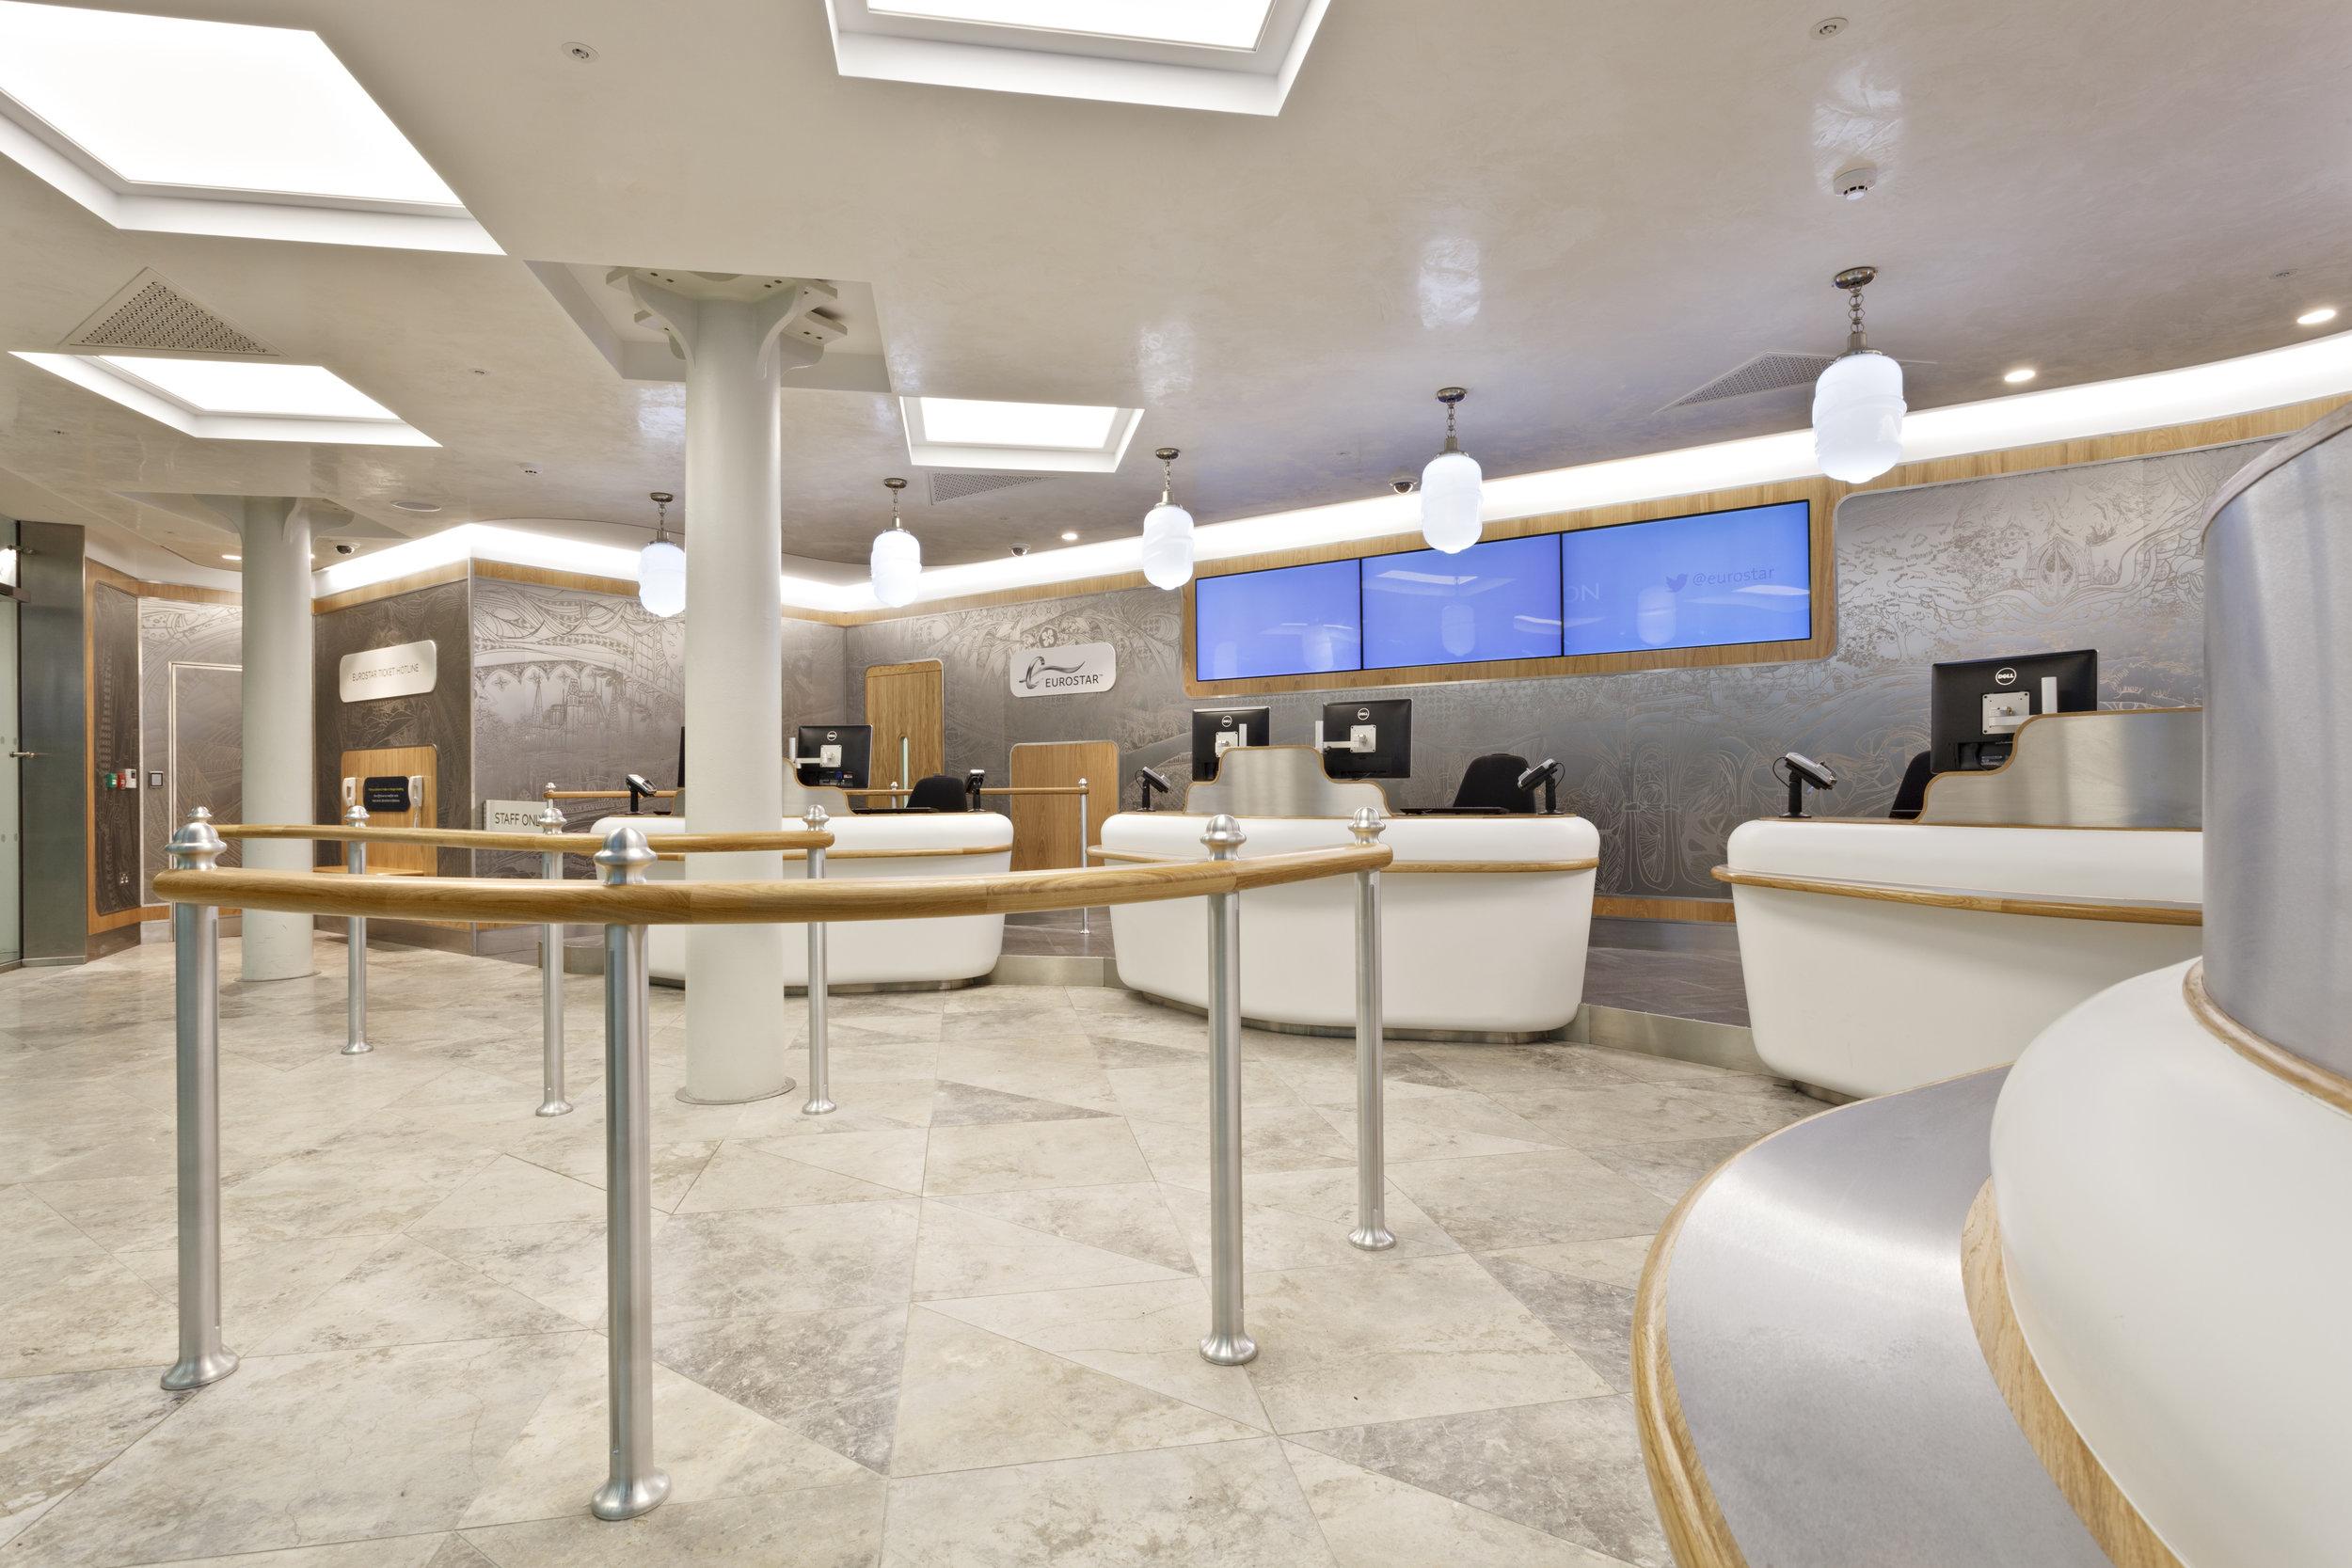 Caino Design - Eurostar - St Pancras - MF 9.jpg